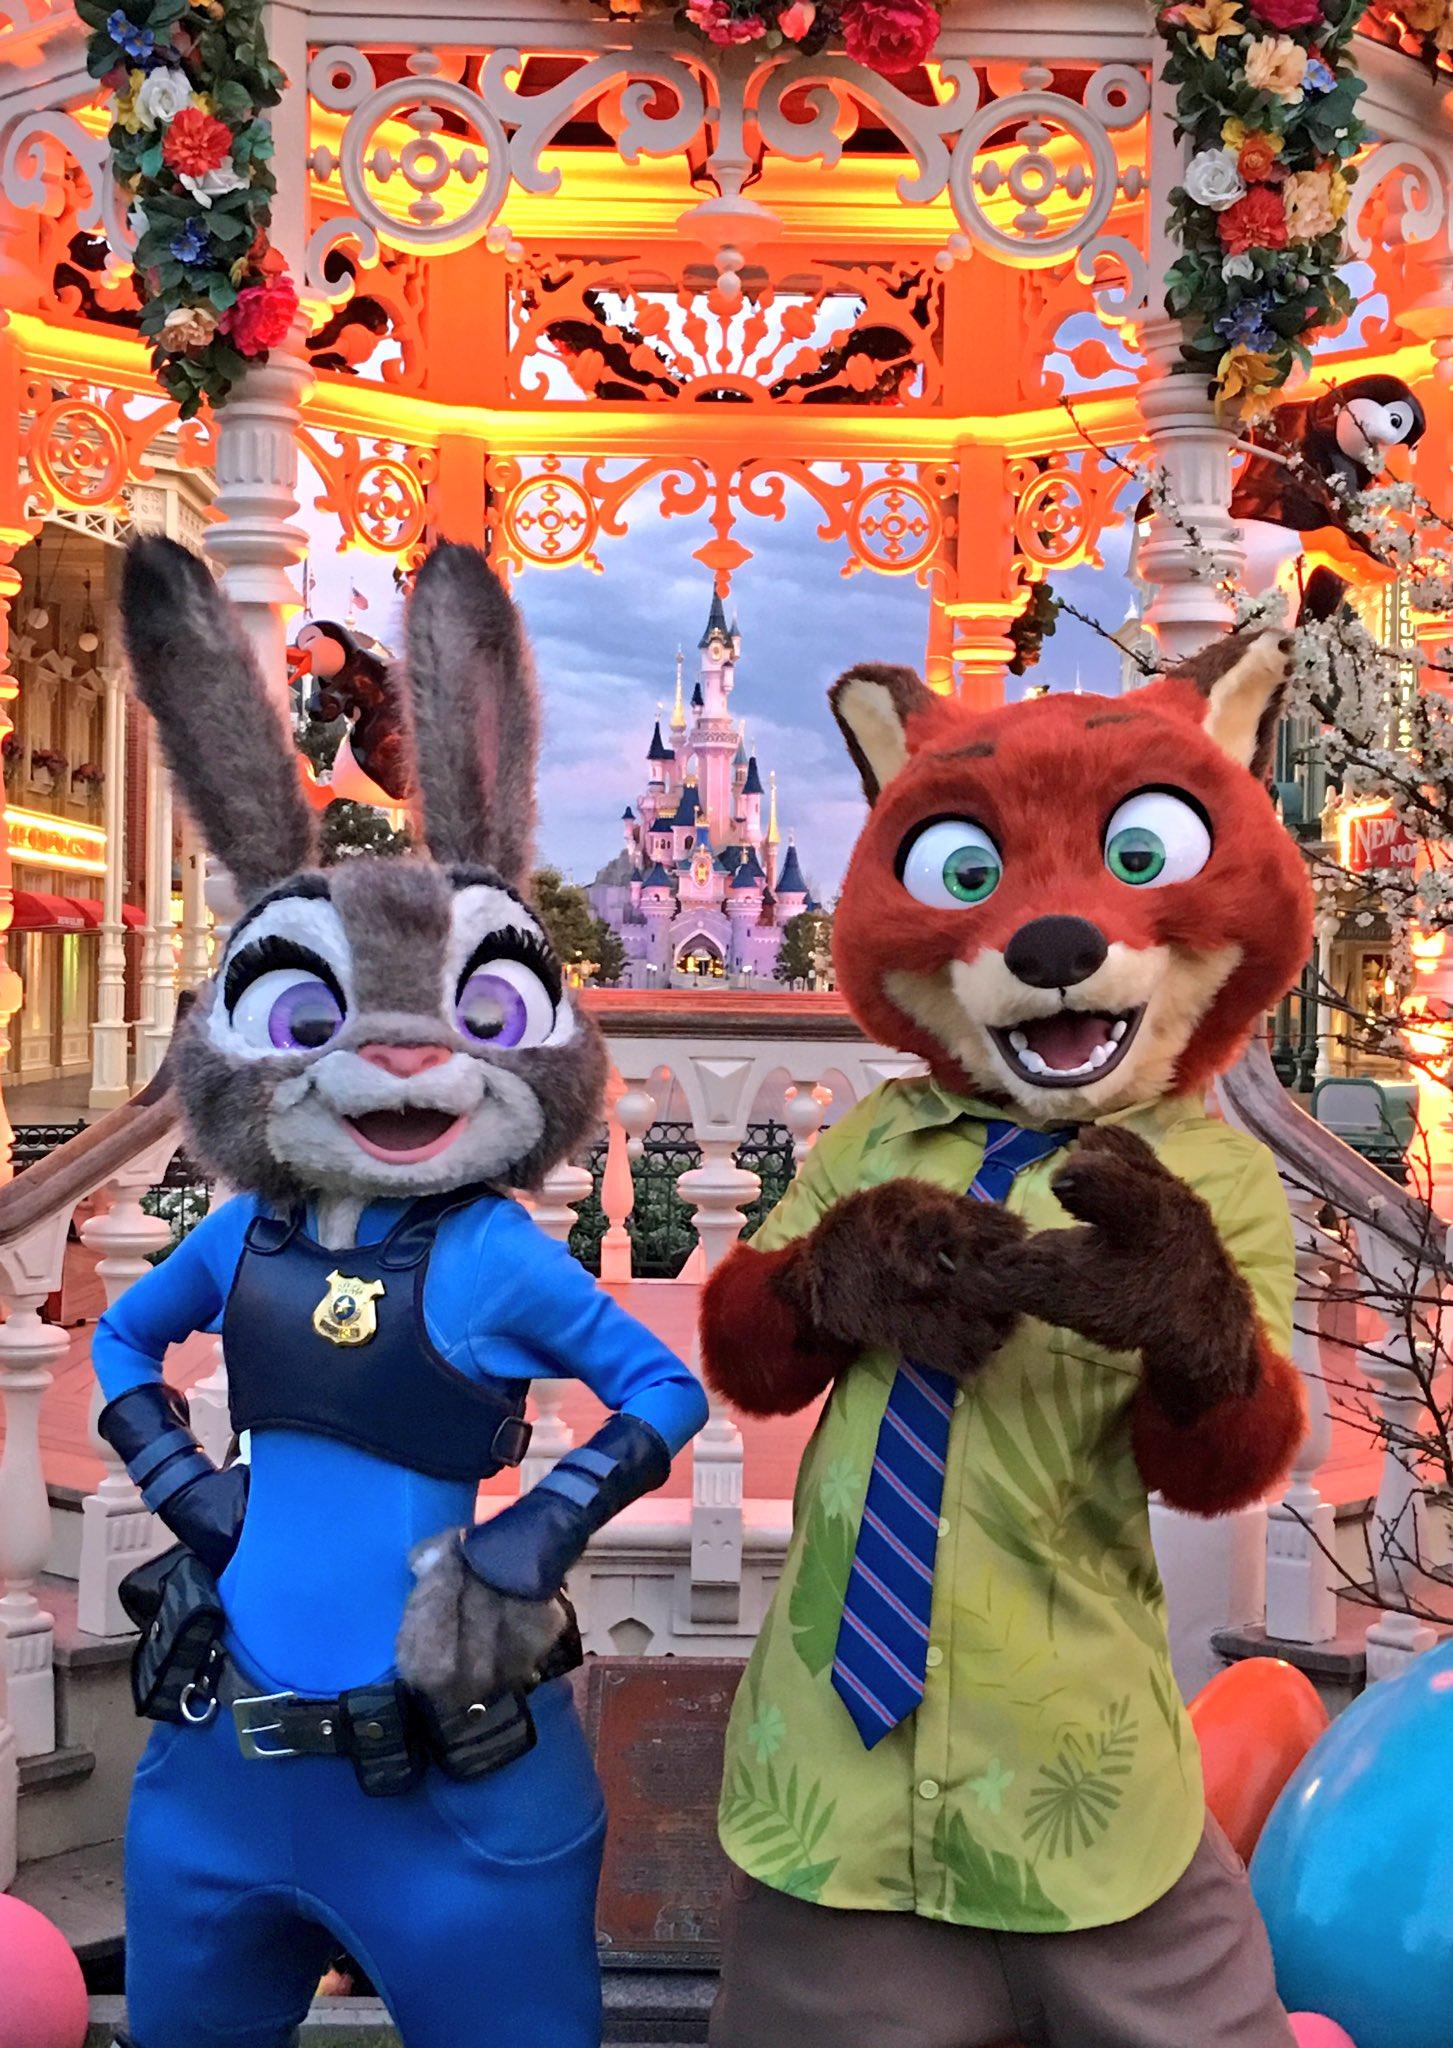 Judy & Nick at #DisneylandParis 💙💚💙💚💙💚 #Zootopia #Zootopie https://t.co/nrH6cniG3S